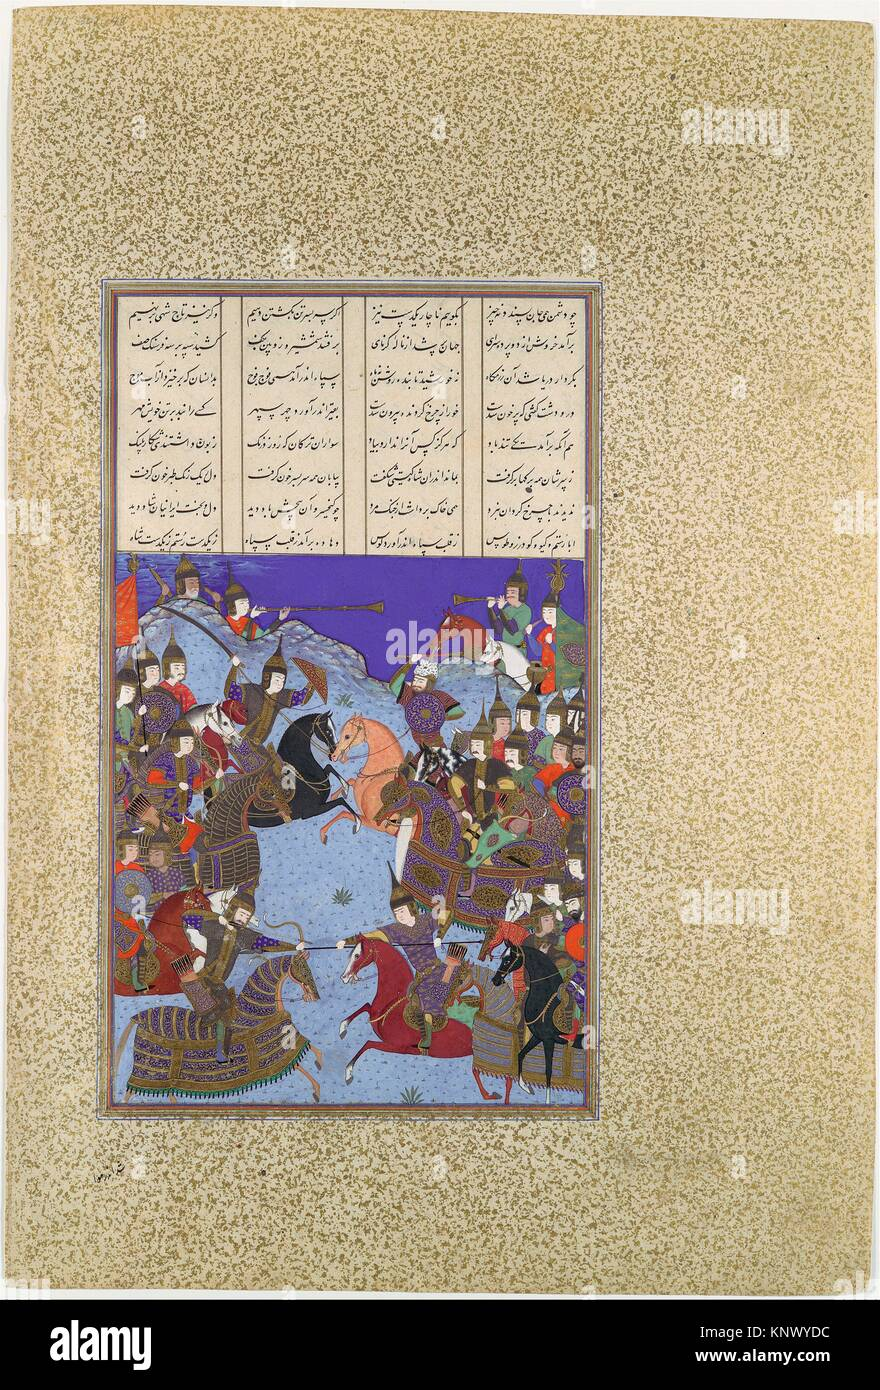 The Night Battle of Kai Khusrau and Afrasiyab, Folio367v from the Shahnama (Book of Kings) of Shah Tahmasp. Author: - Stock Image